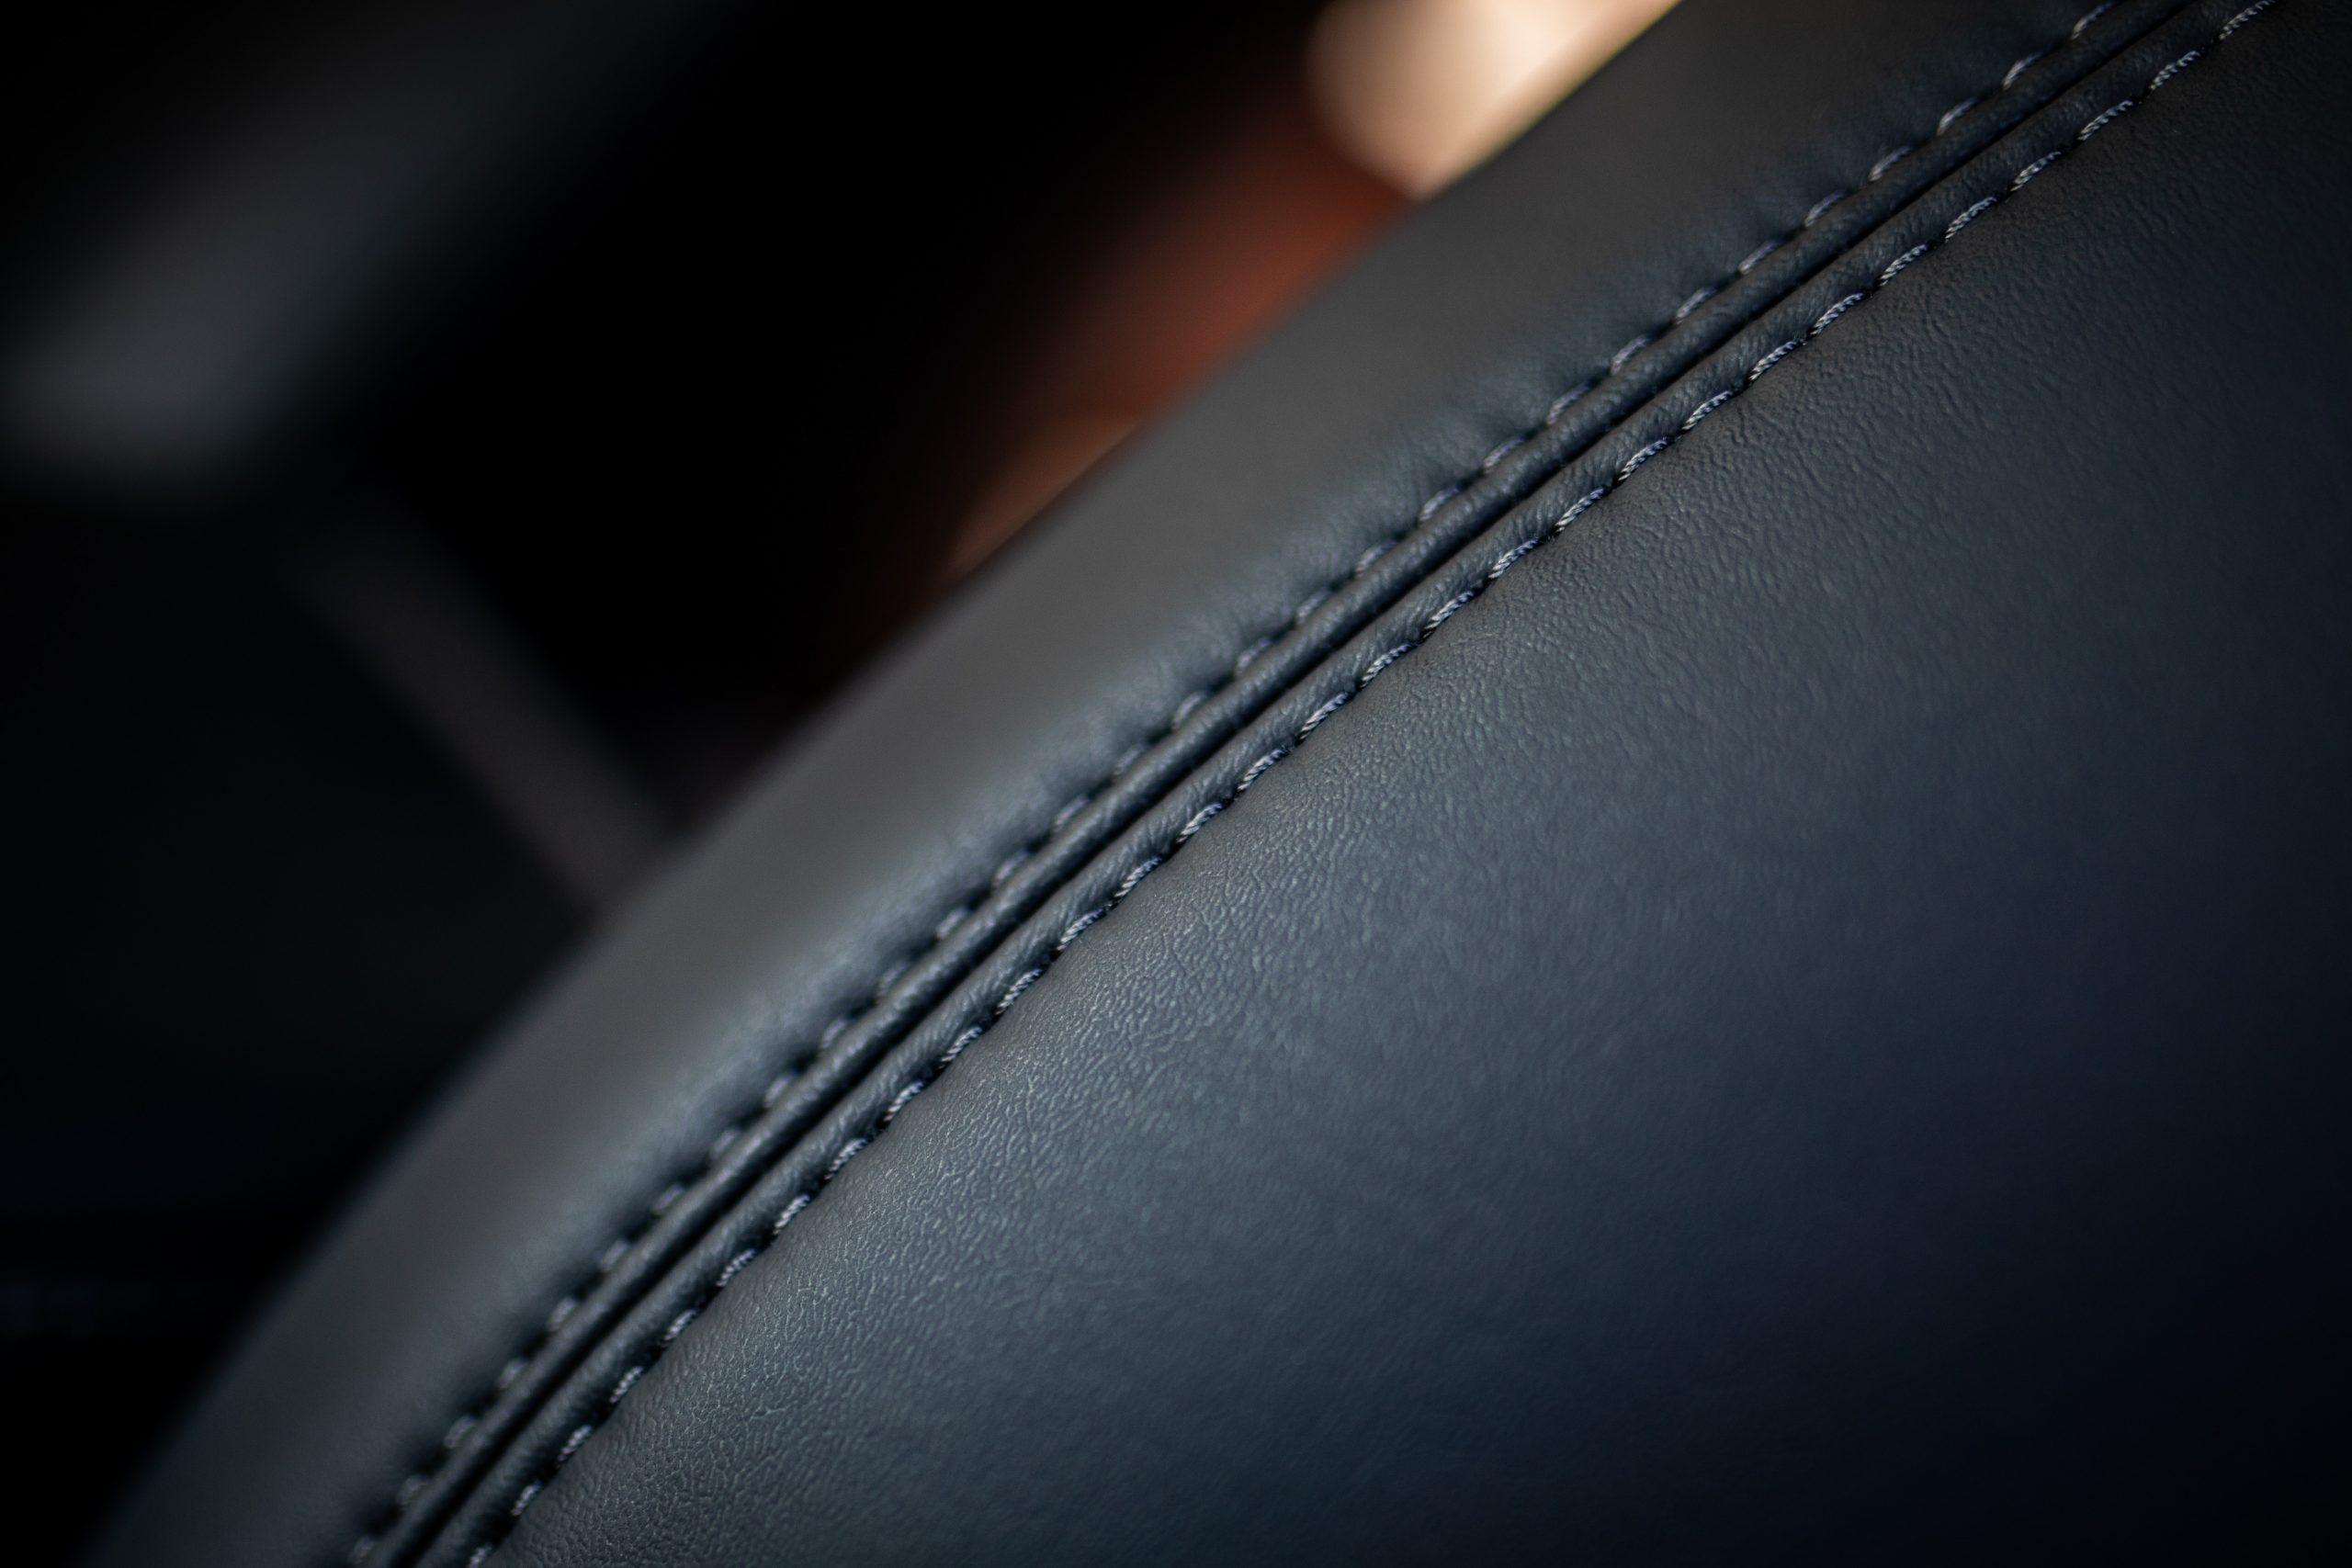 Tesla Model Y leather seat stitching detail